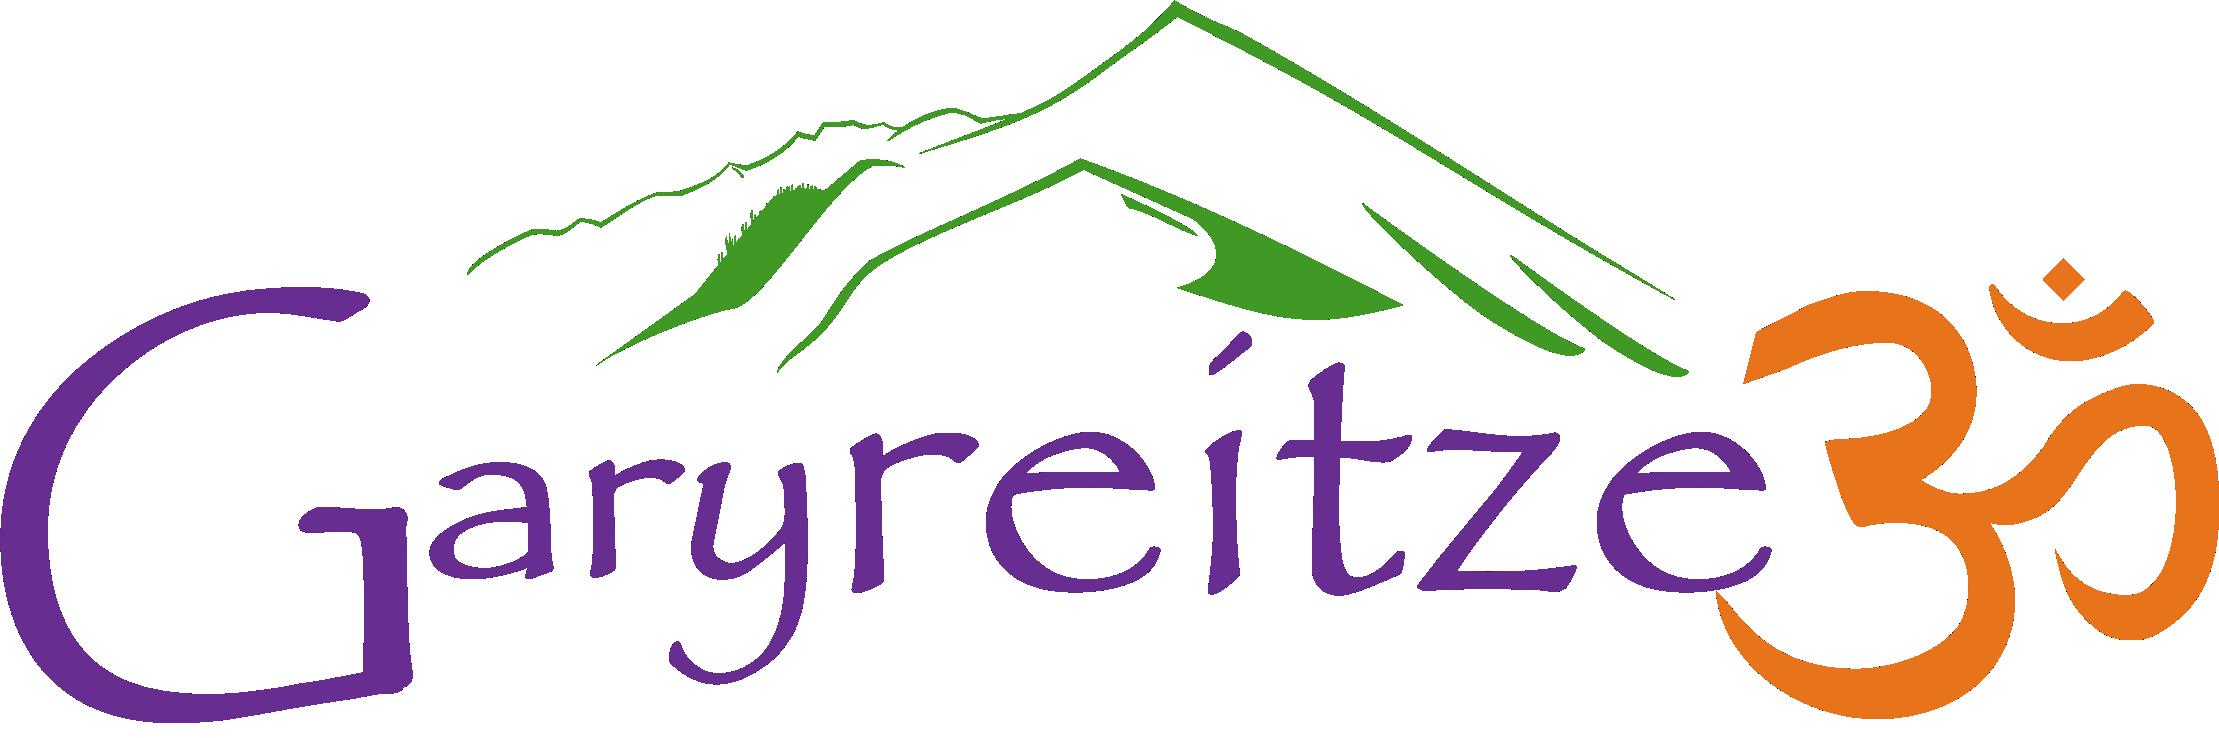 Gary Reitze | Certified Iyengar Yoga Teacher